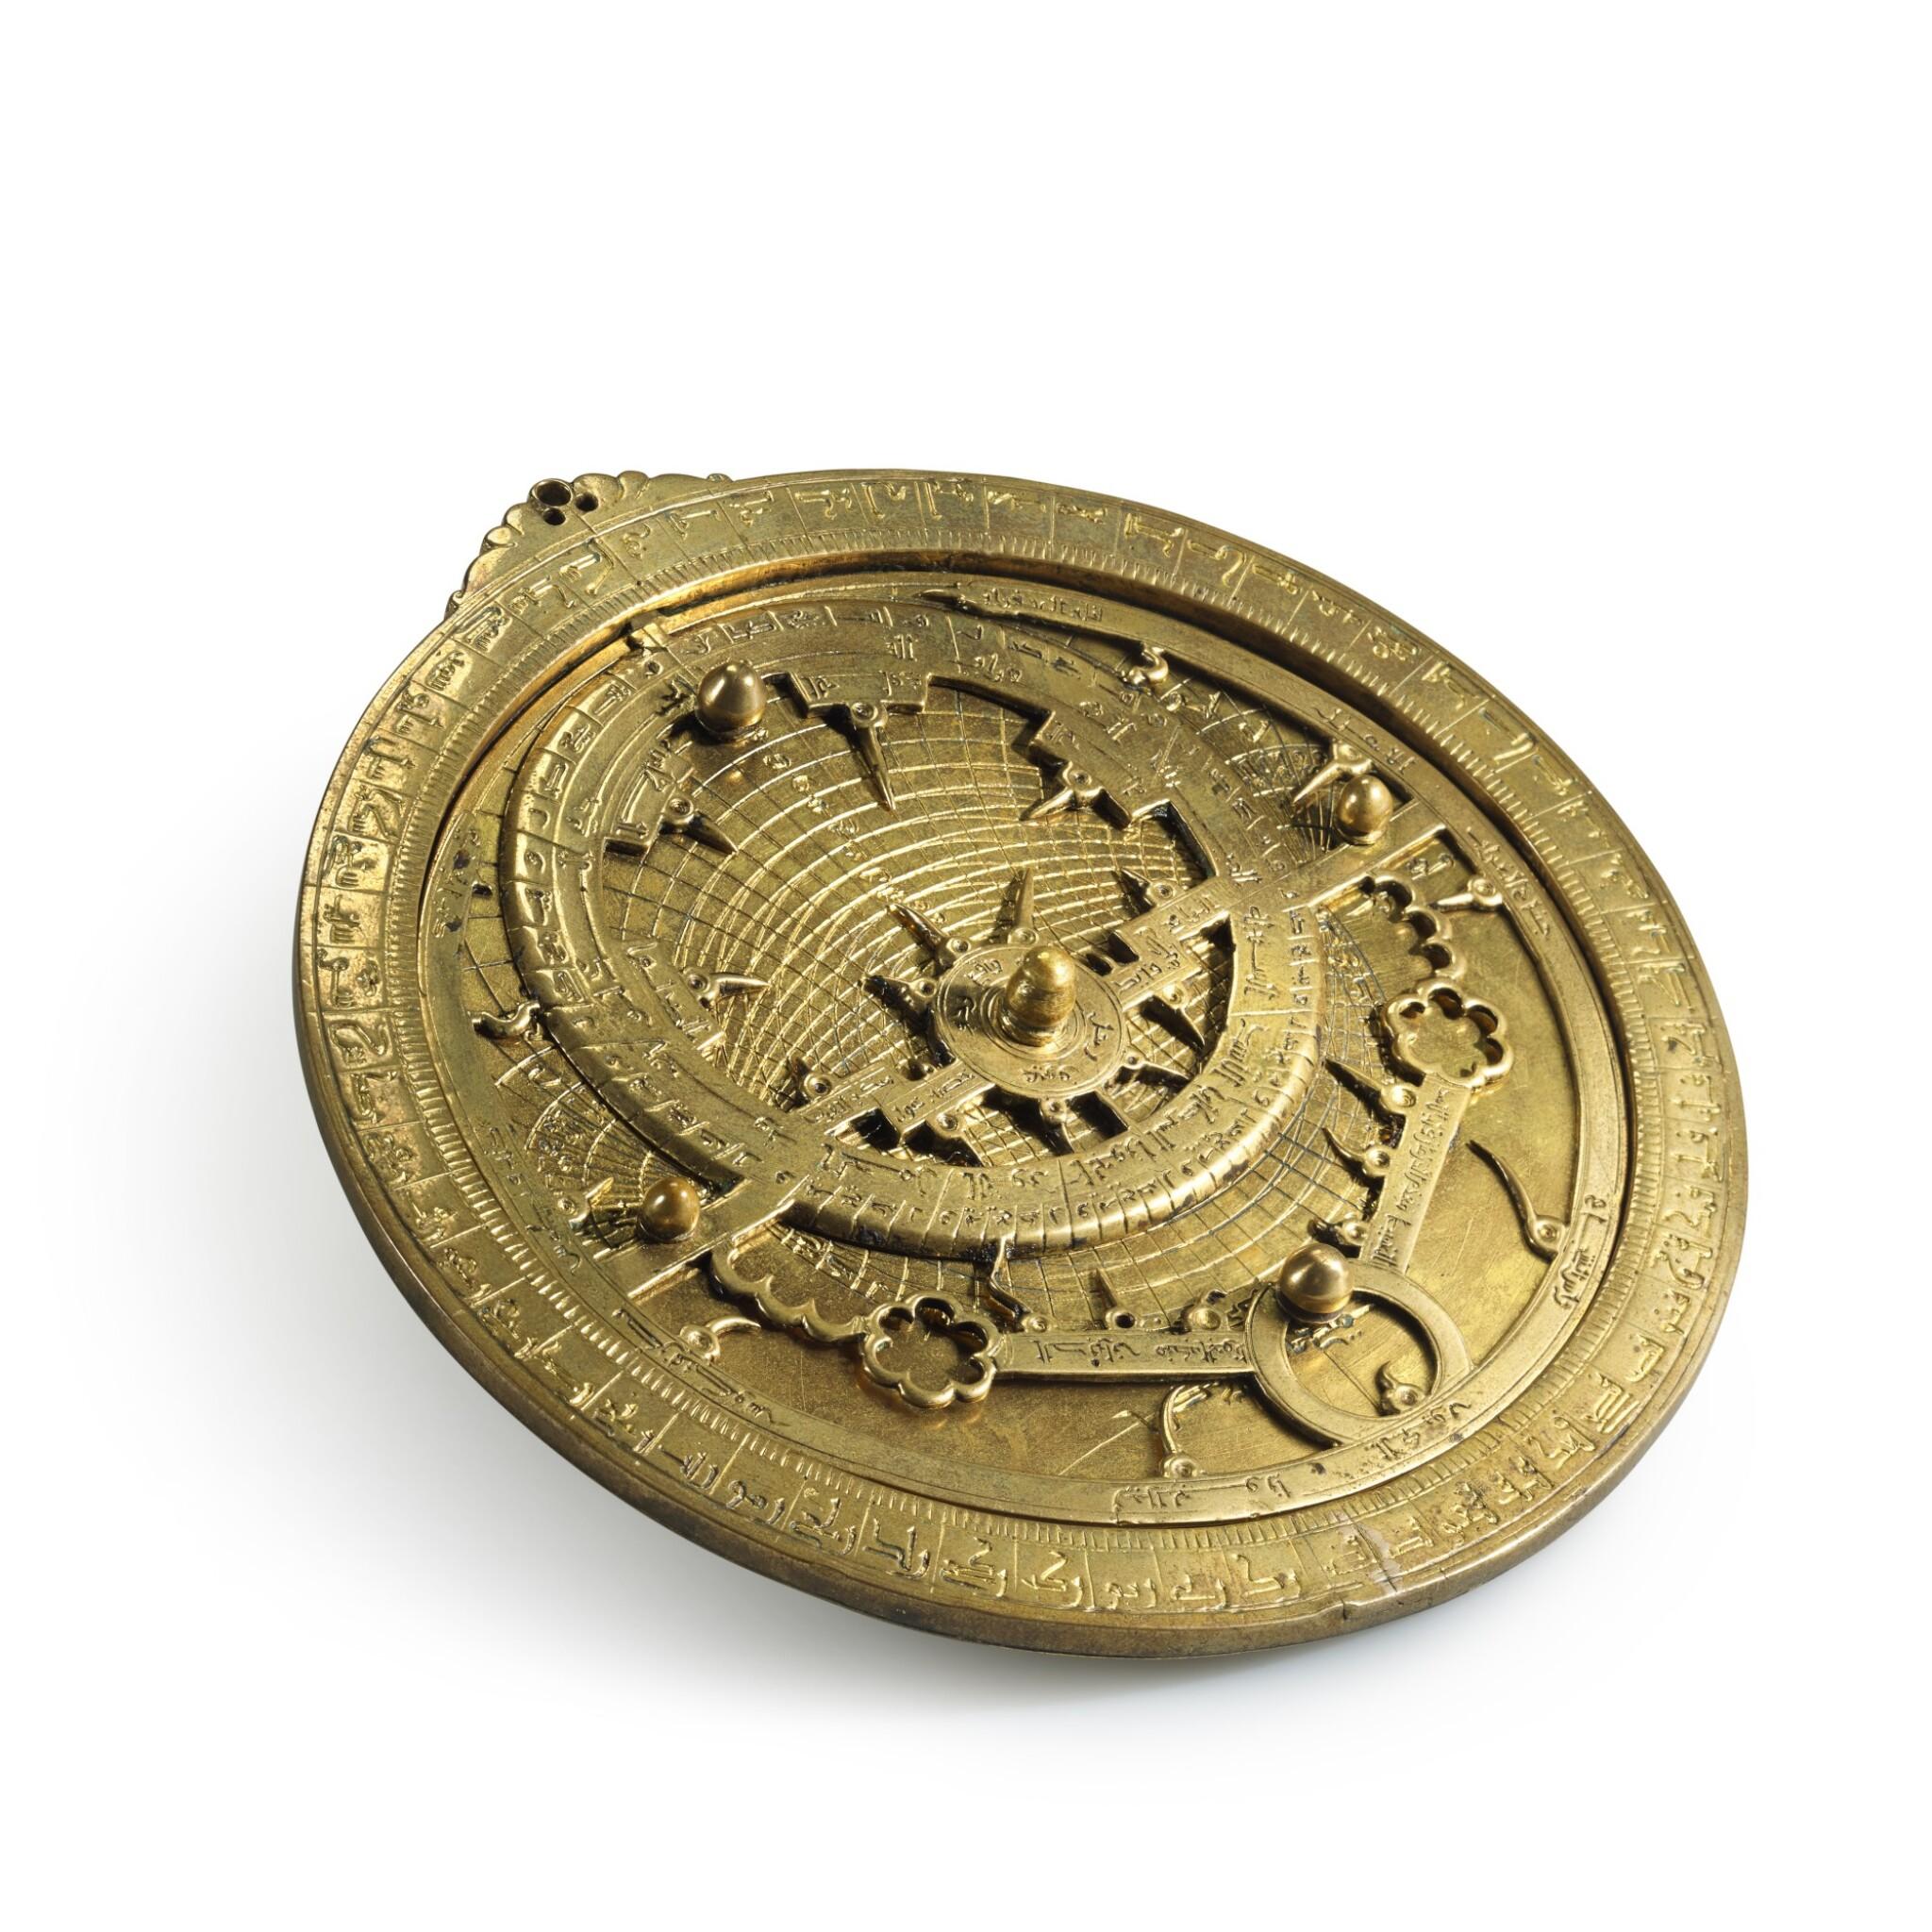 View full screen - View 1 of Lot 66. A gilt-brass astrolabe signed by Ahmad ibn Abu 'Abdallah al-Qurtubi al-Yamani, North-East Spain, Tudela, dated 737 AH/1336-37 AD.